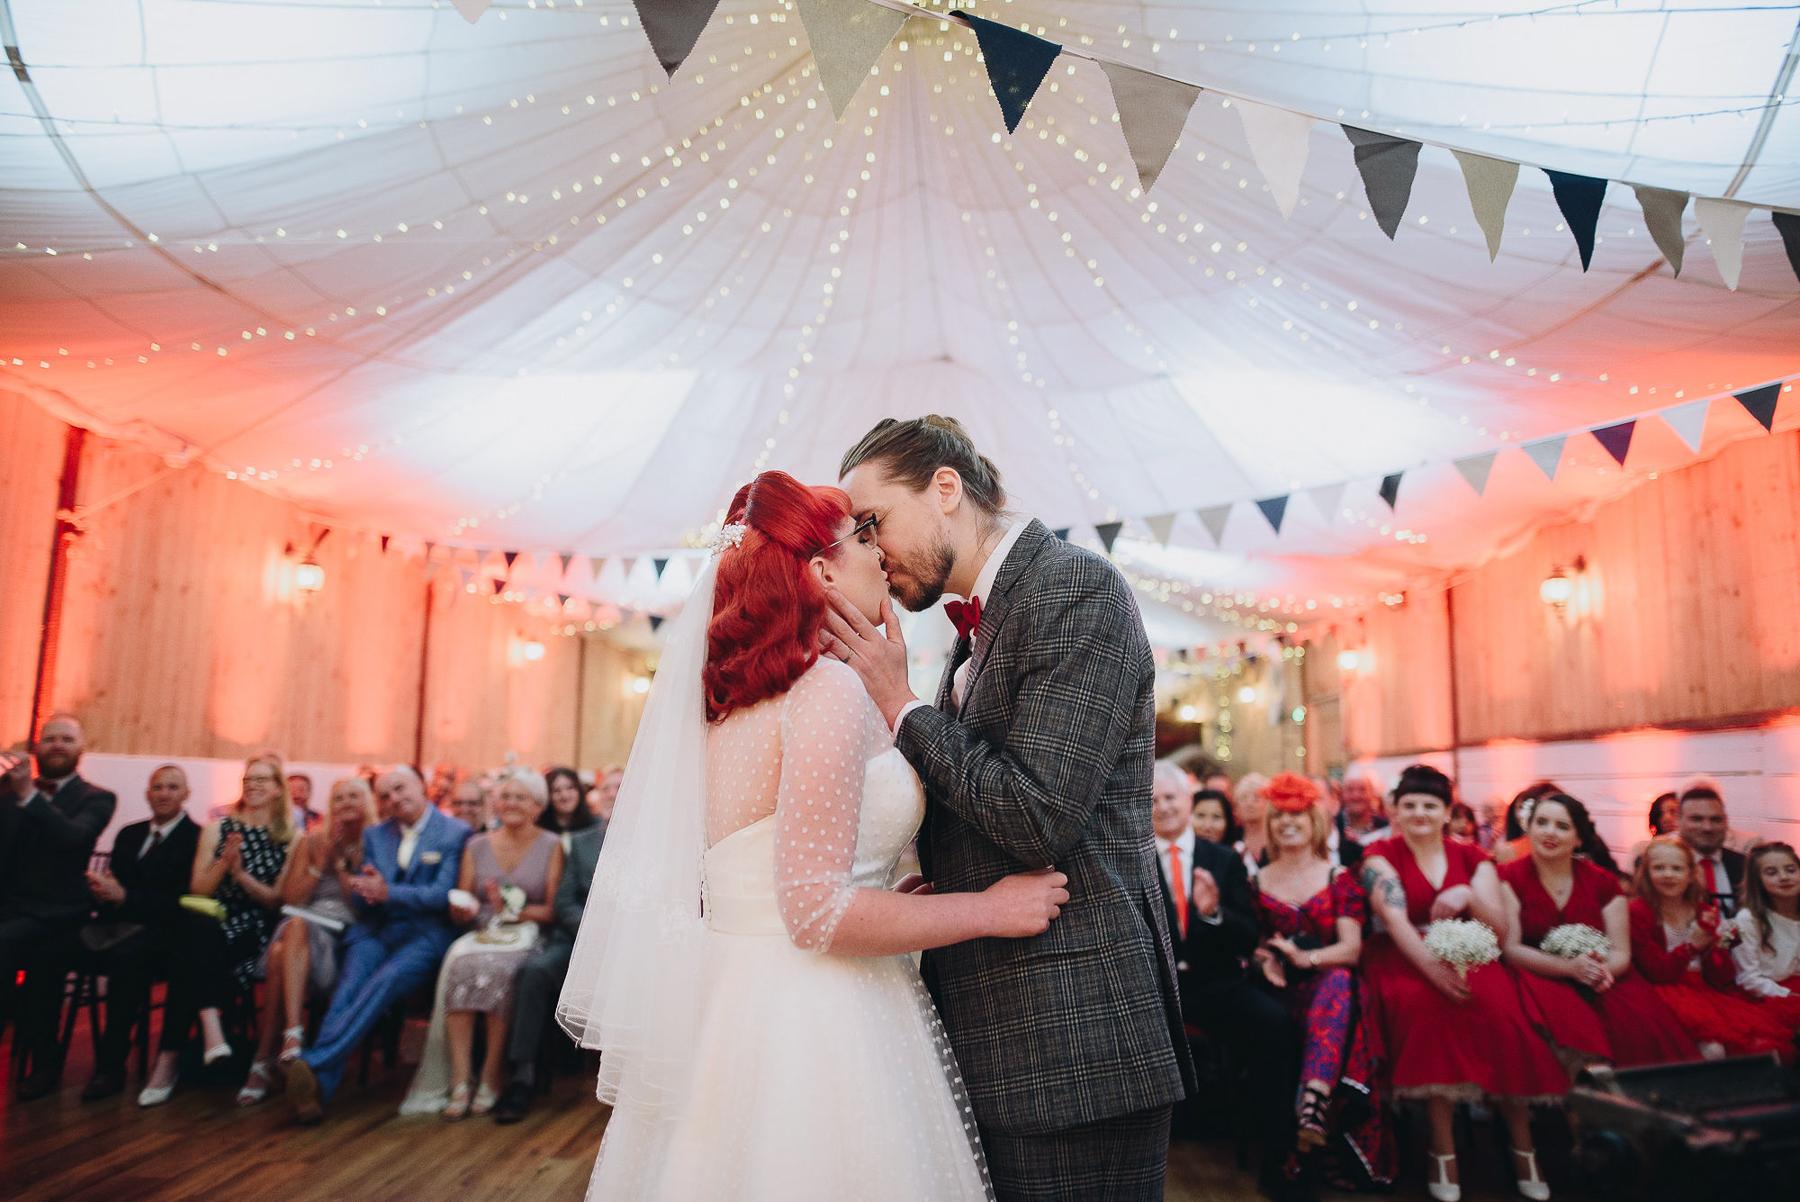 Wellbeing_Farm_Wedding_Photography_The_Pin-Up_Bride_Lara_Shaun-69.jpg